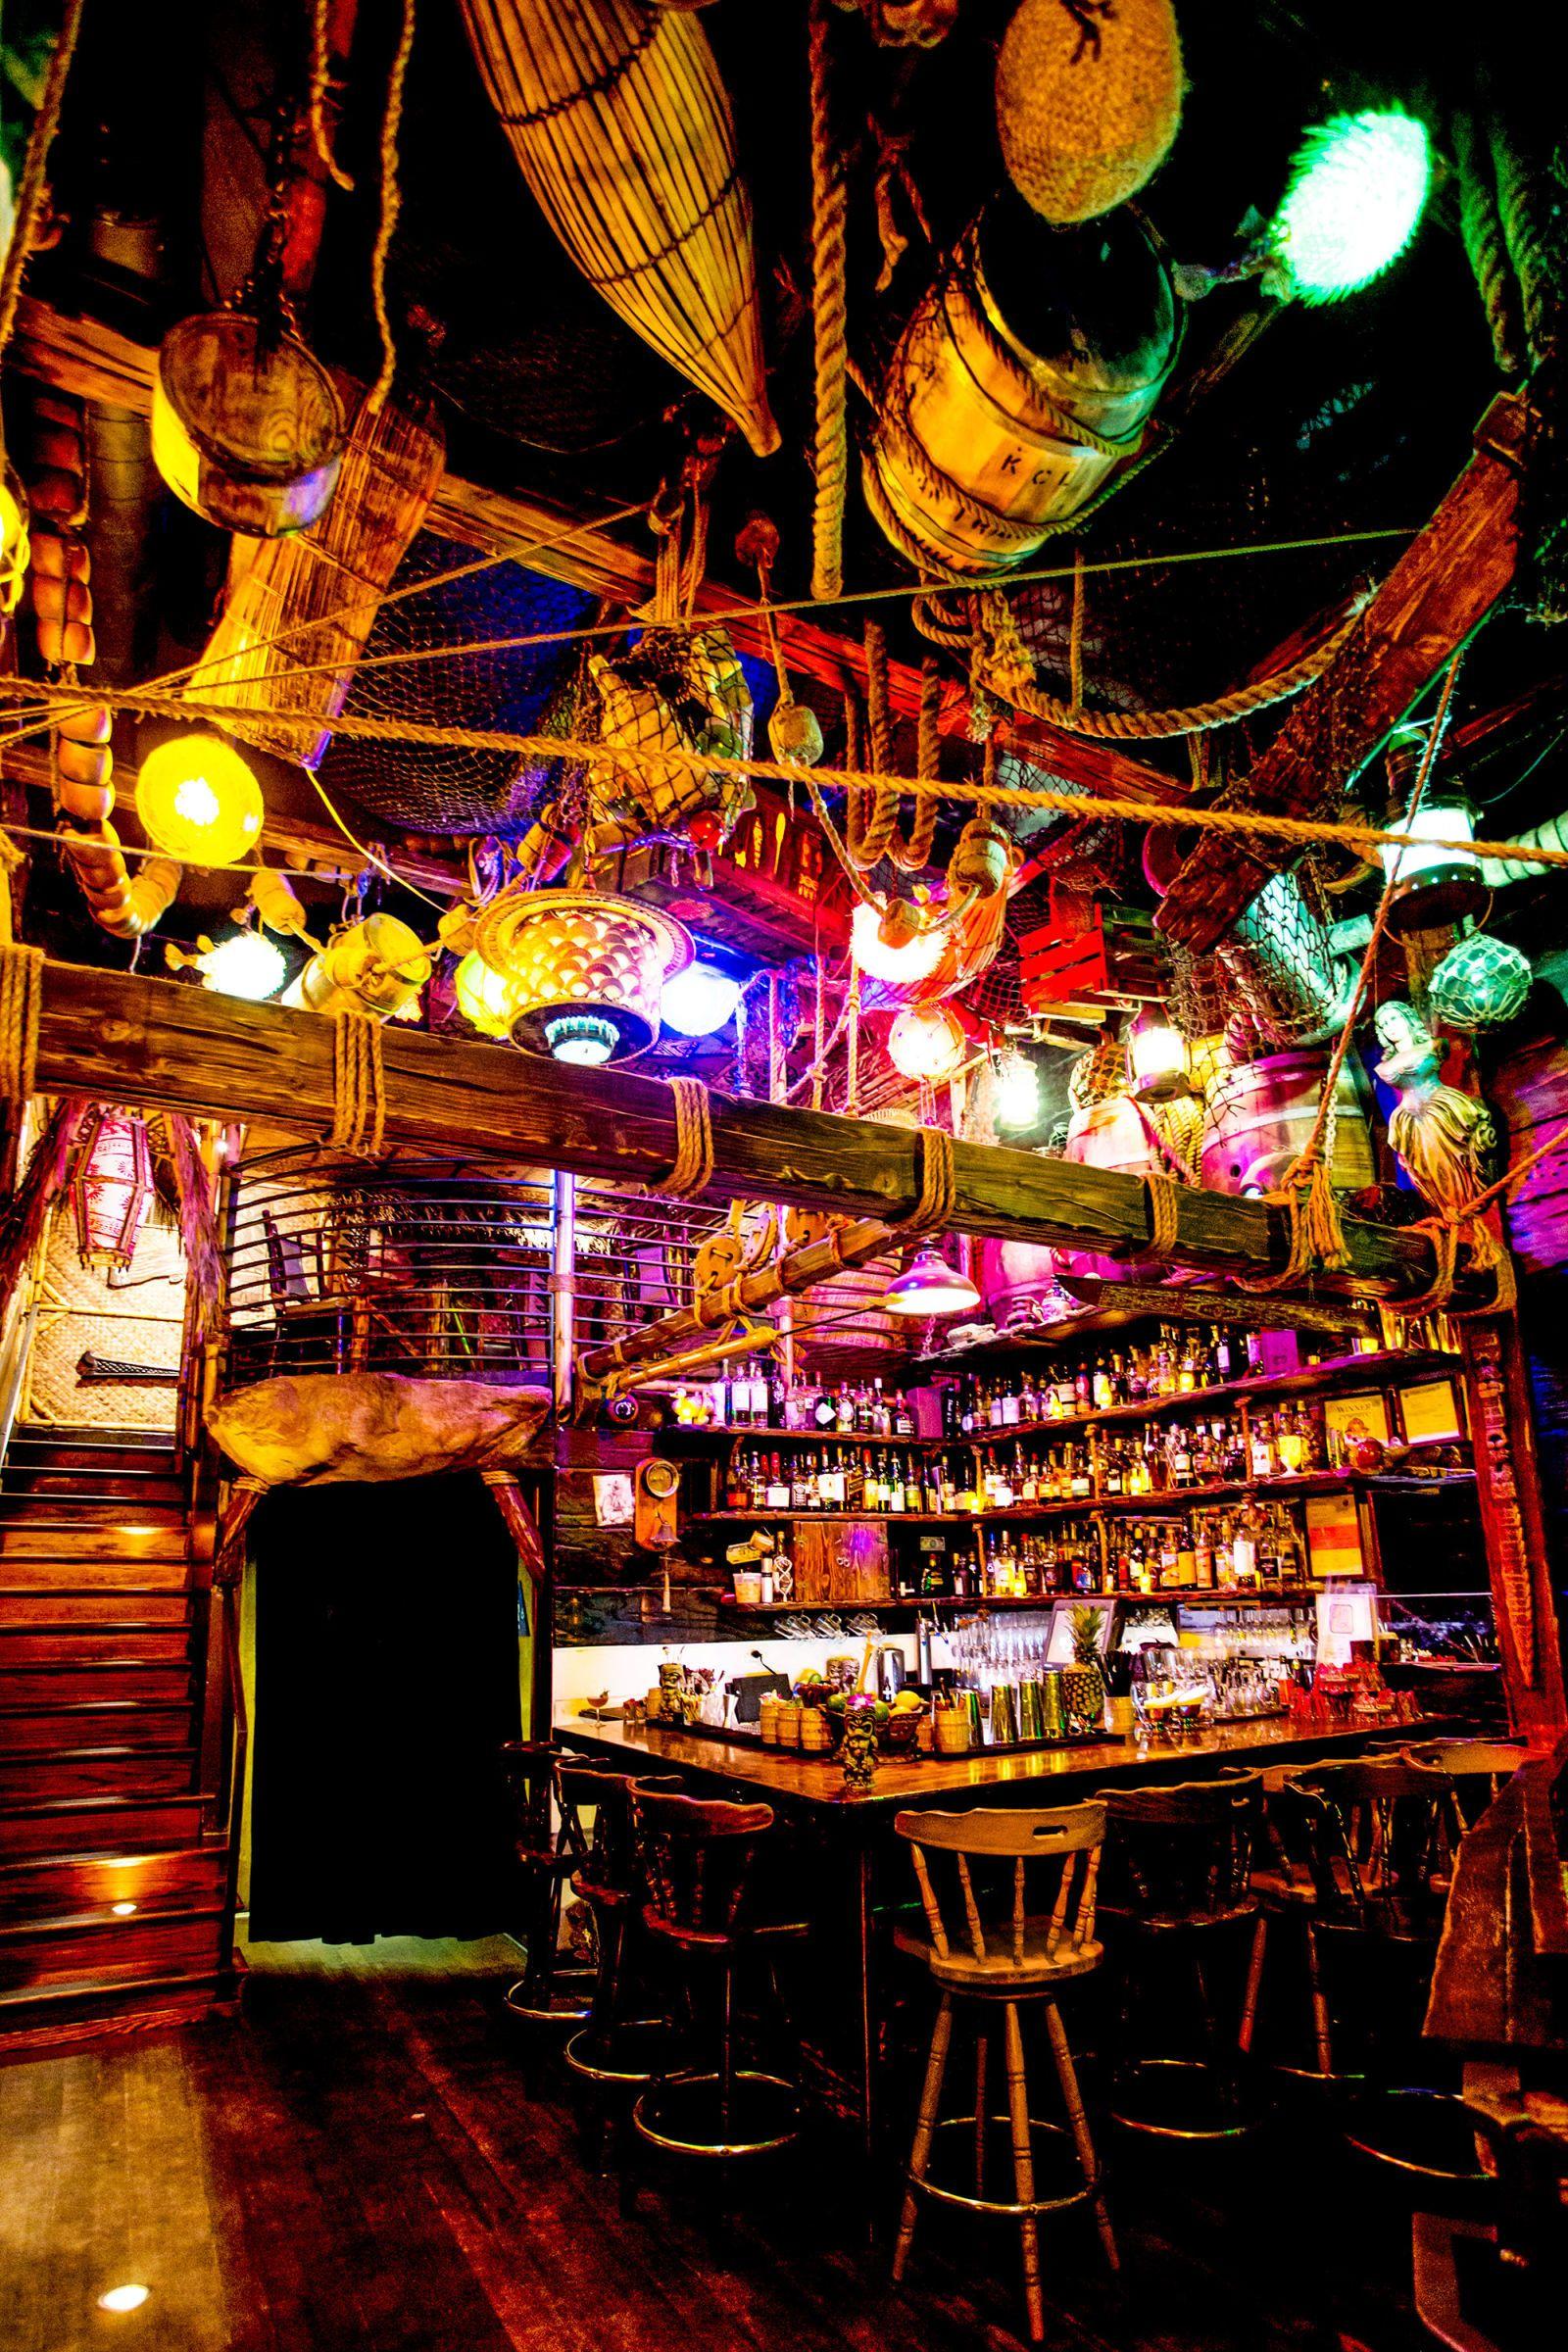 Esquire S 18 Best Bars In America Tiki Bar Decor Tiki Bar Tiki Decor